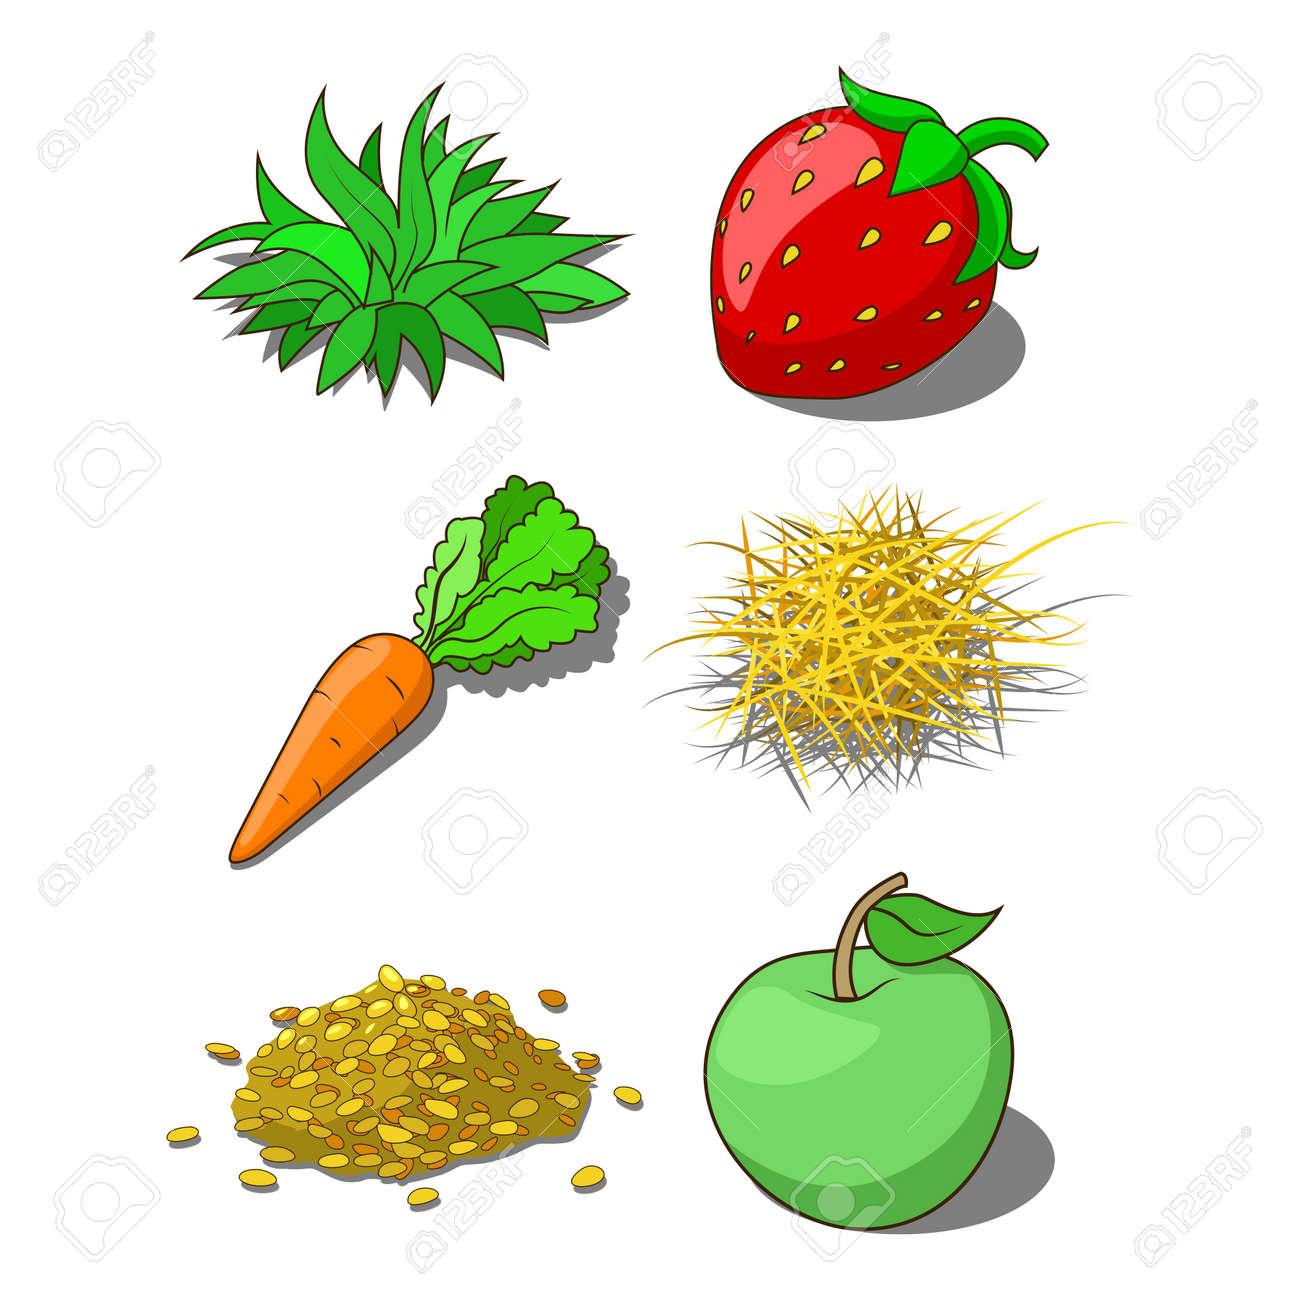 animals food corn grass hay carrot vector illustration royalty free